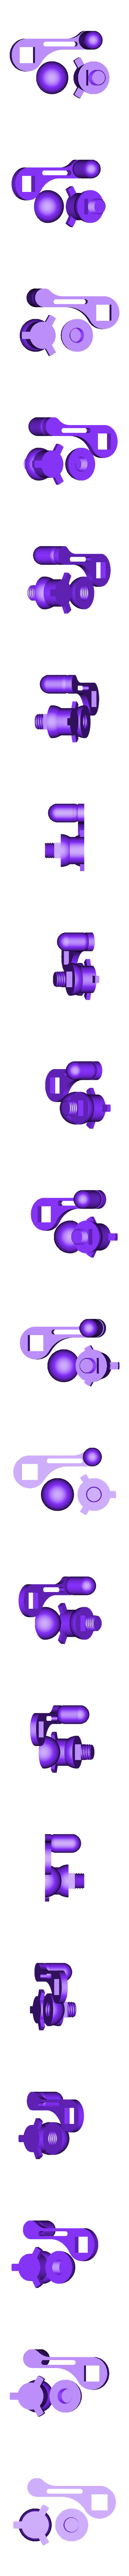 crank.stl Download free STL file Coffee Grinder • 3D printer template, Wachet